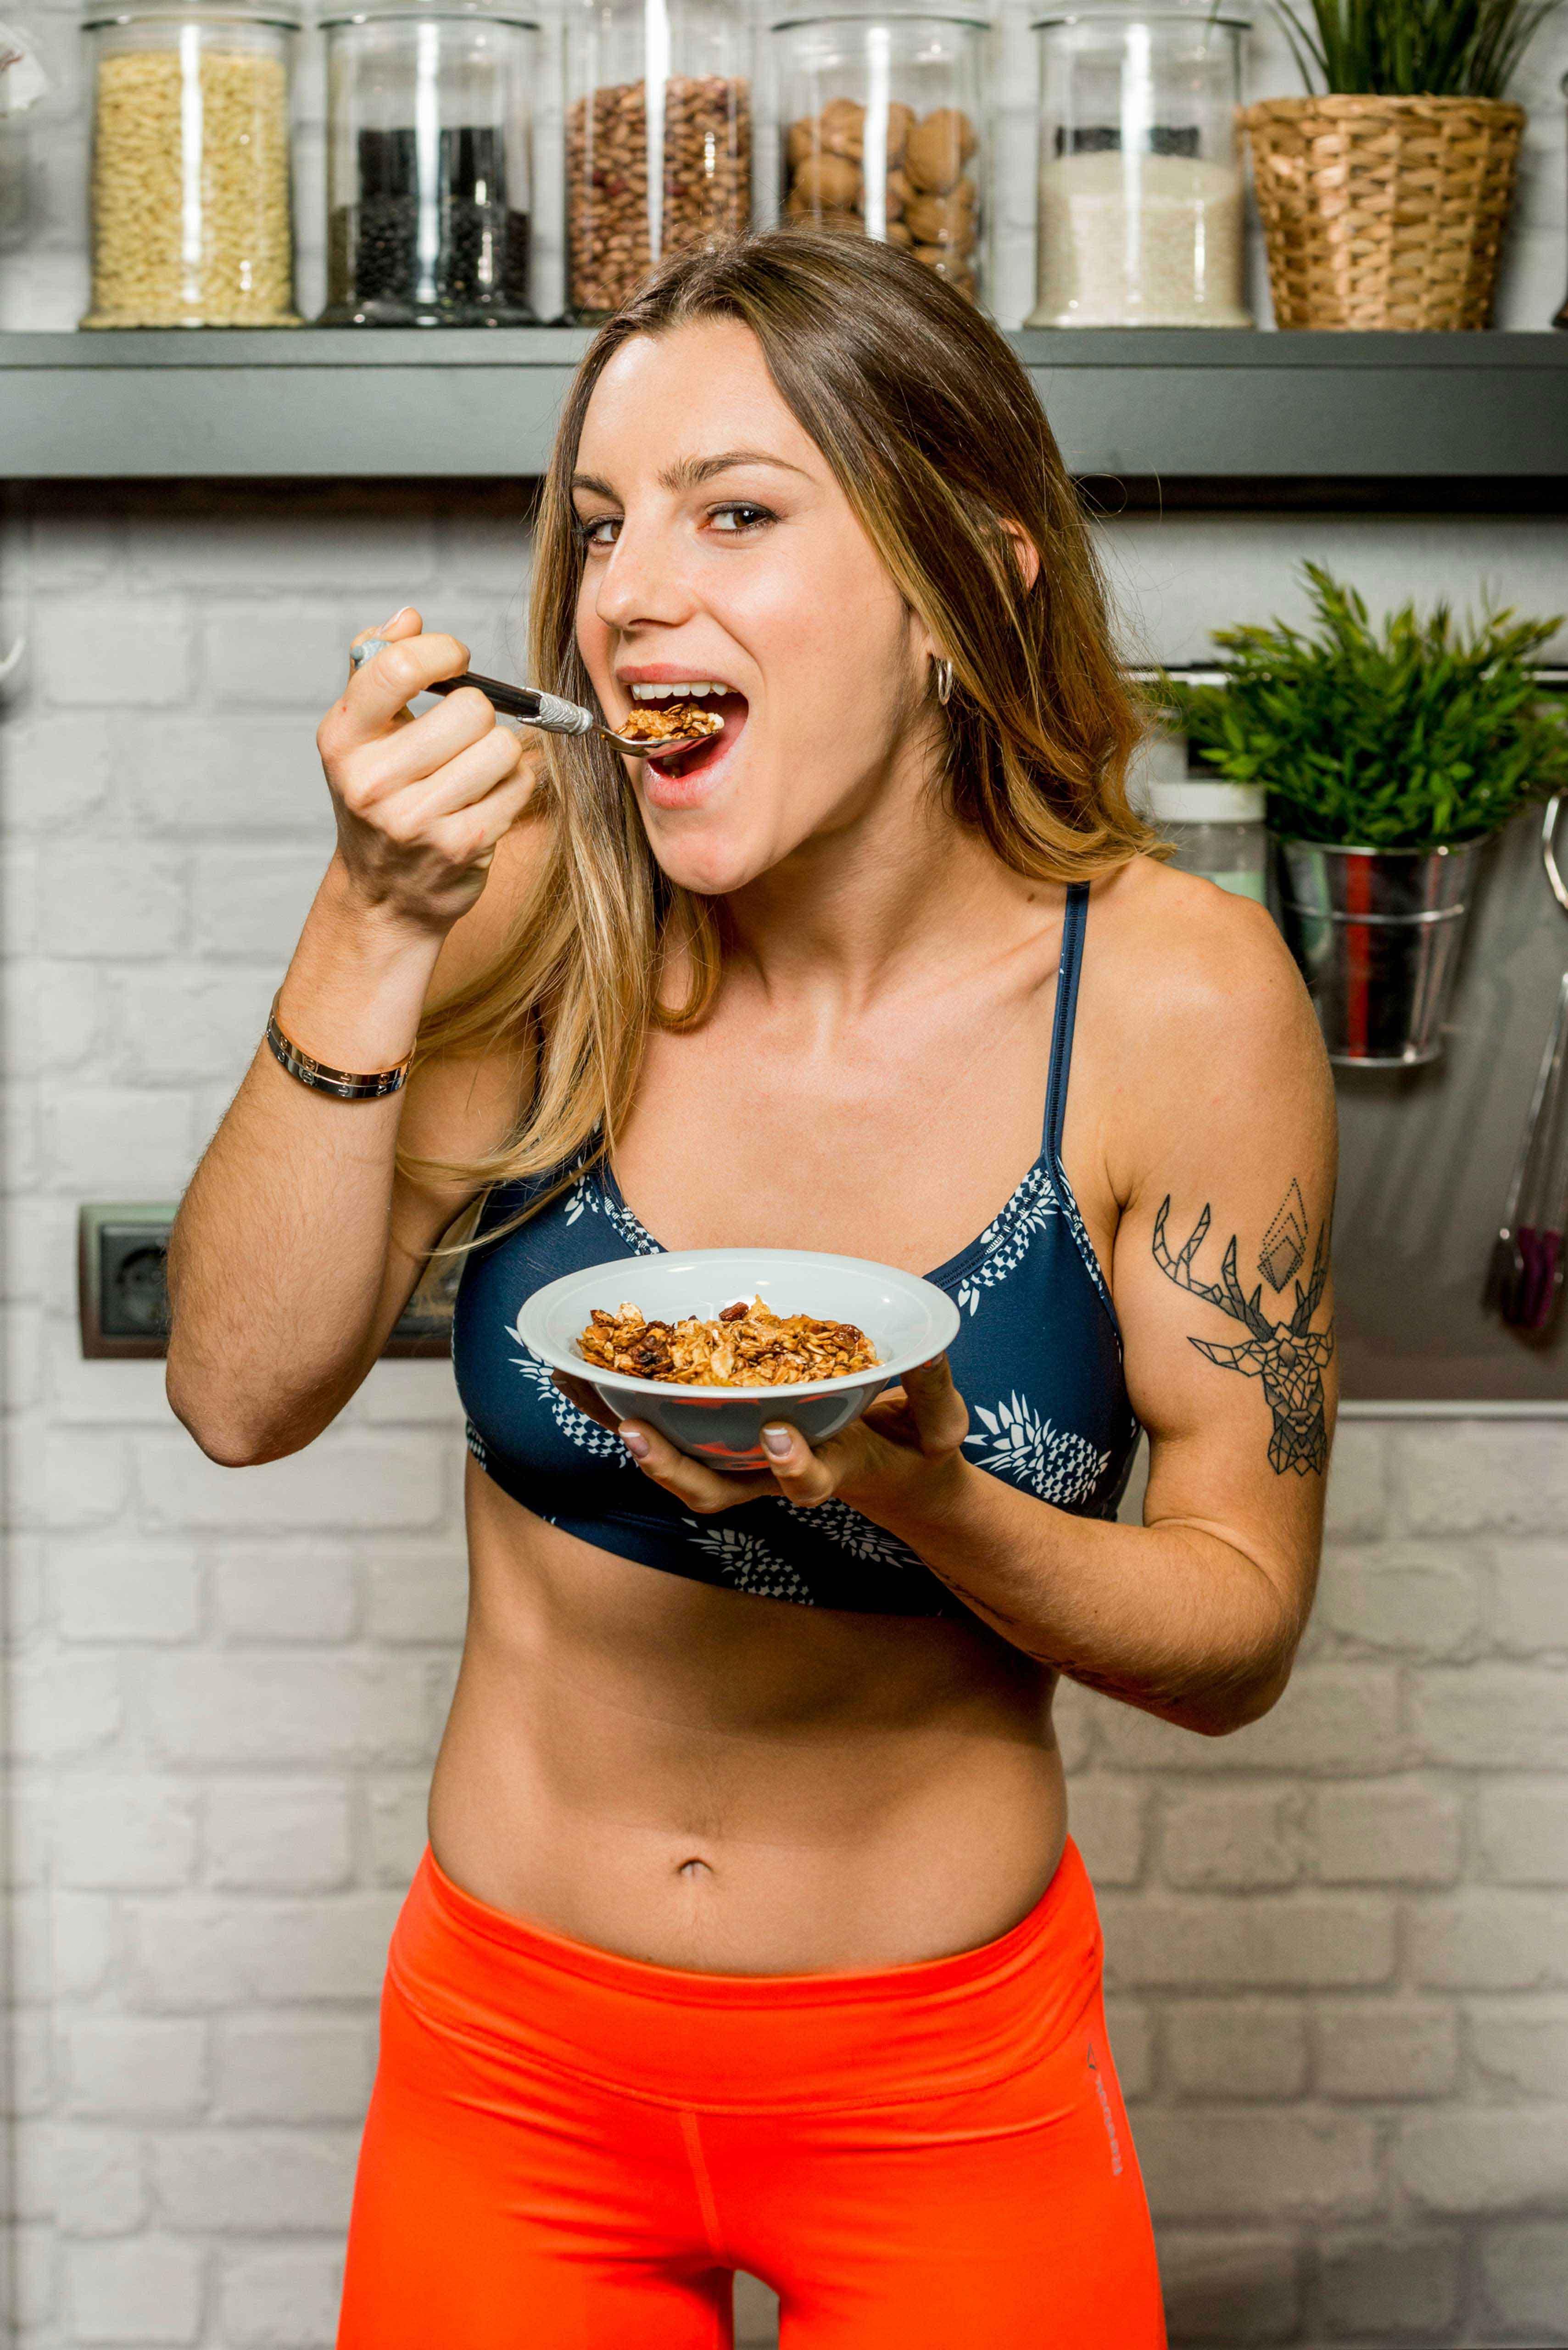 Vikika, presentadora de La cocina fitness de Vikika, disfrutando de su desayuno